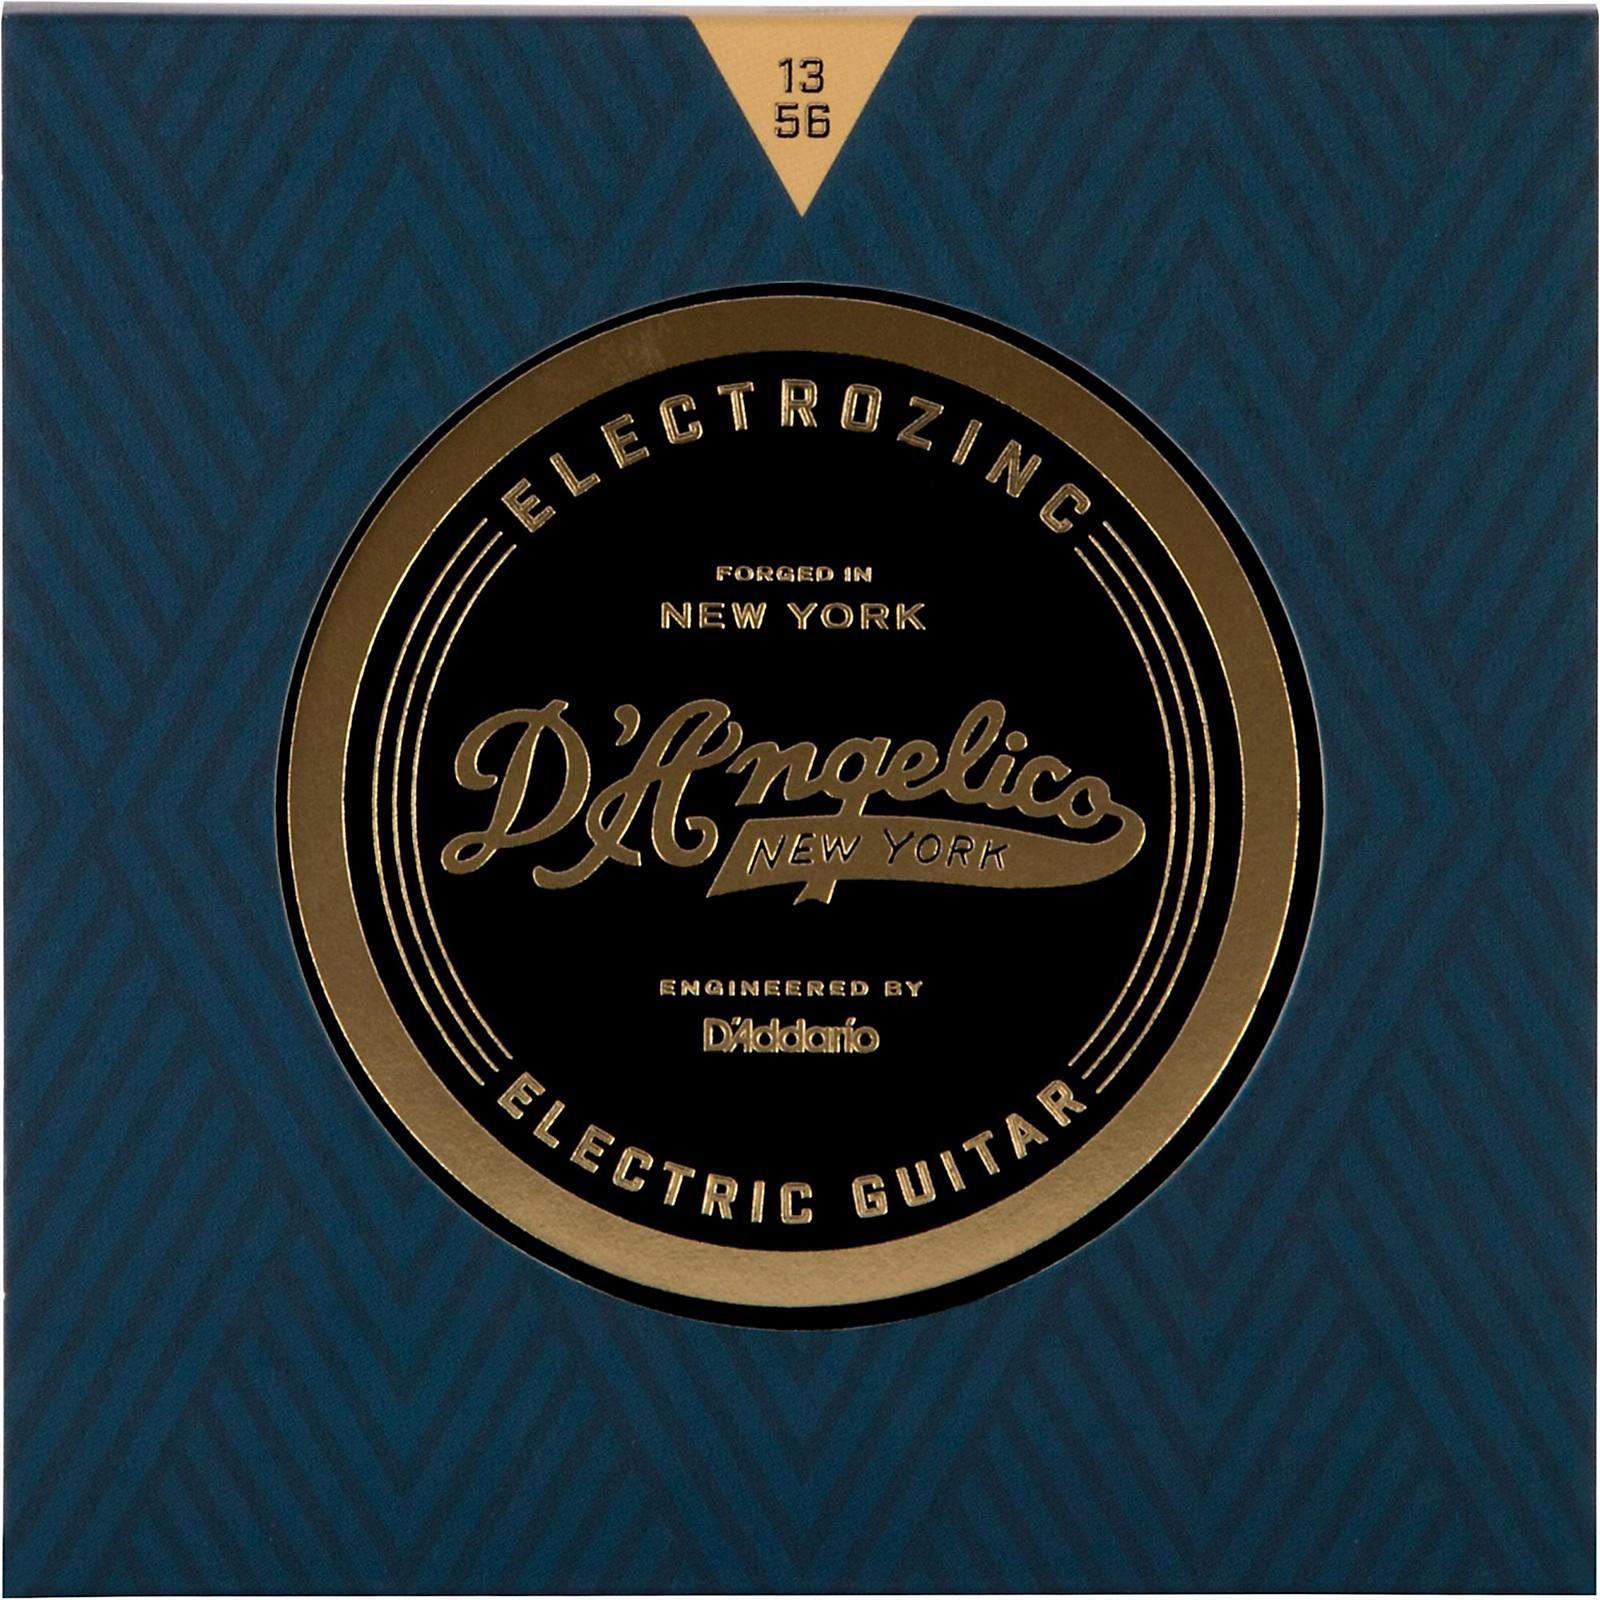 D'Angelico Electrozinc Jazz 13-56 Medium Electric Guitar Strings